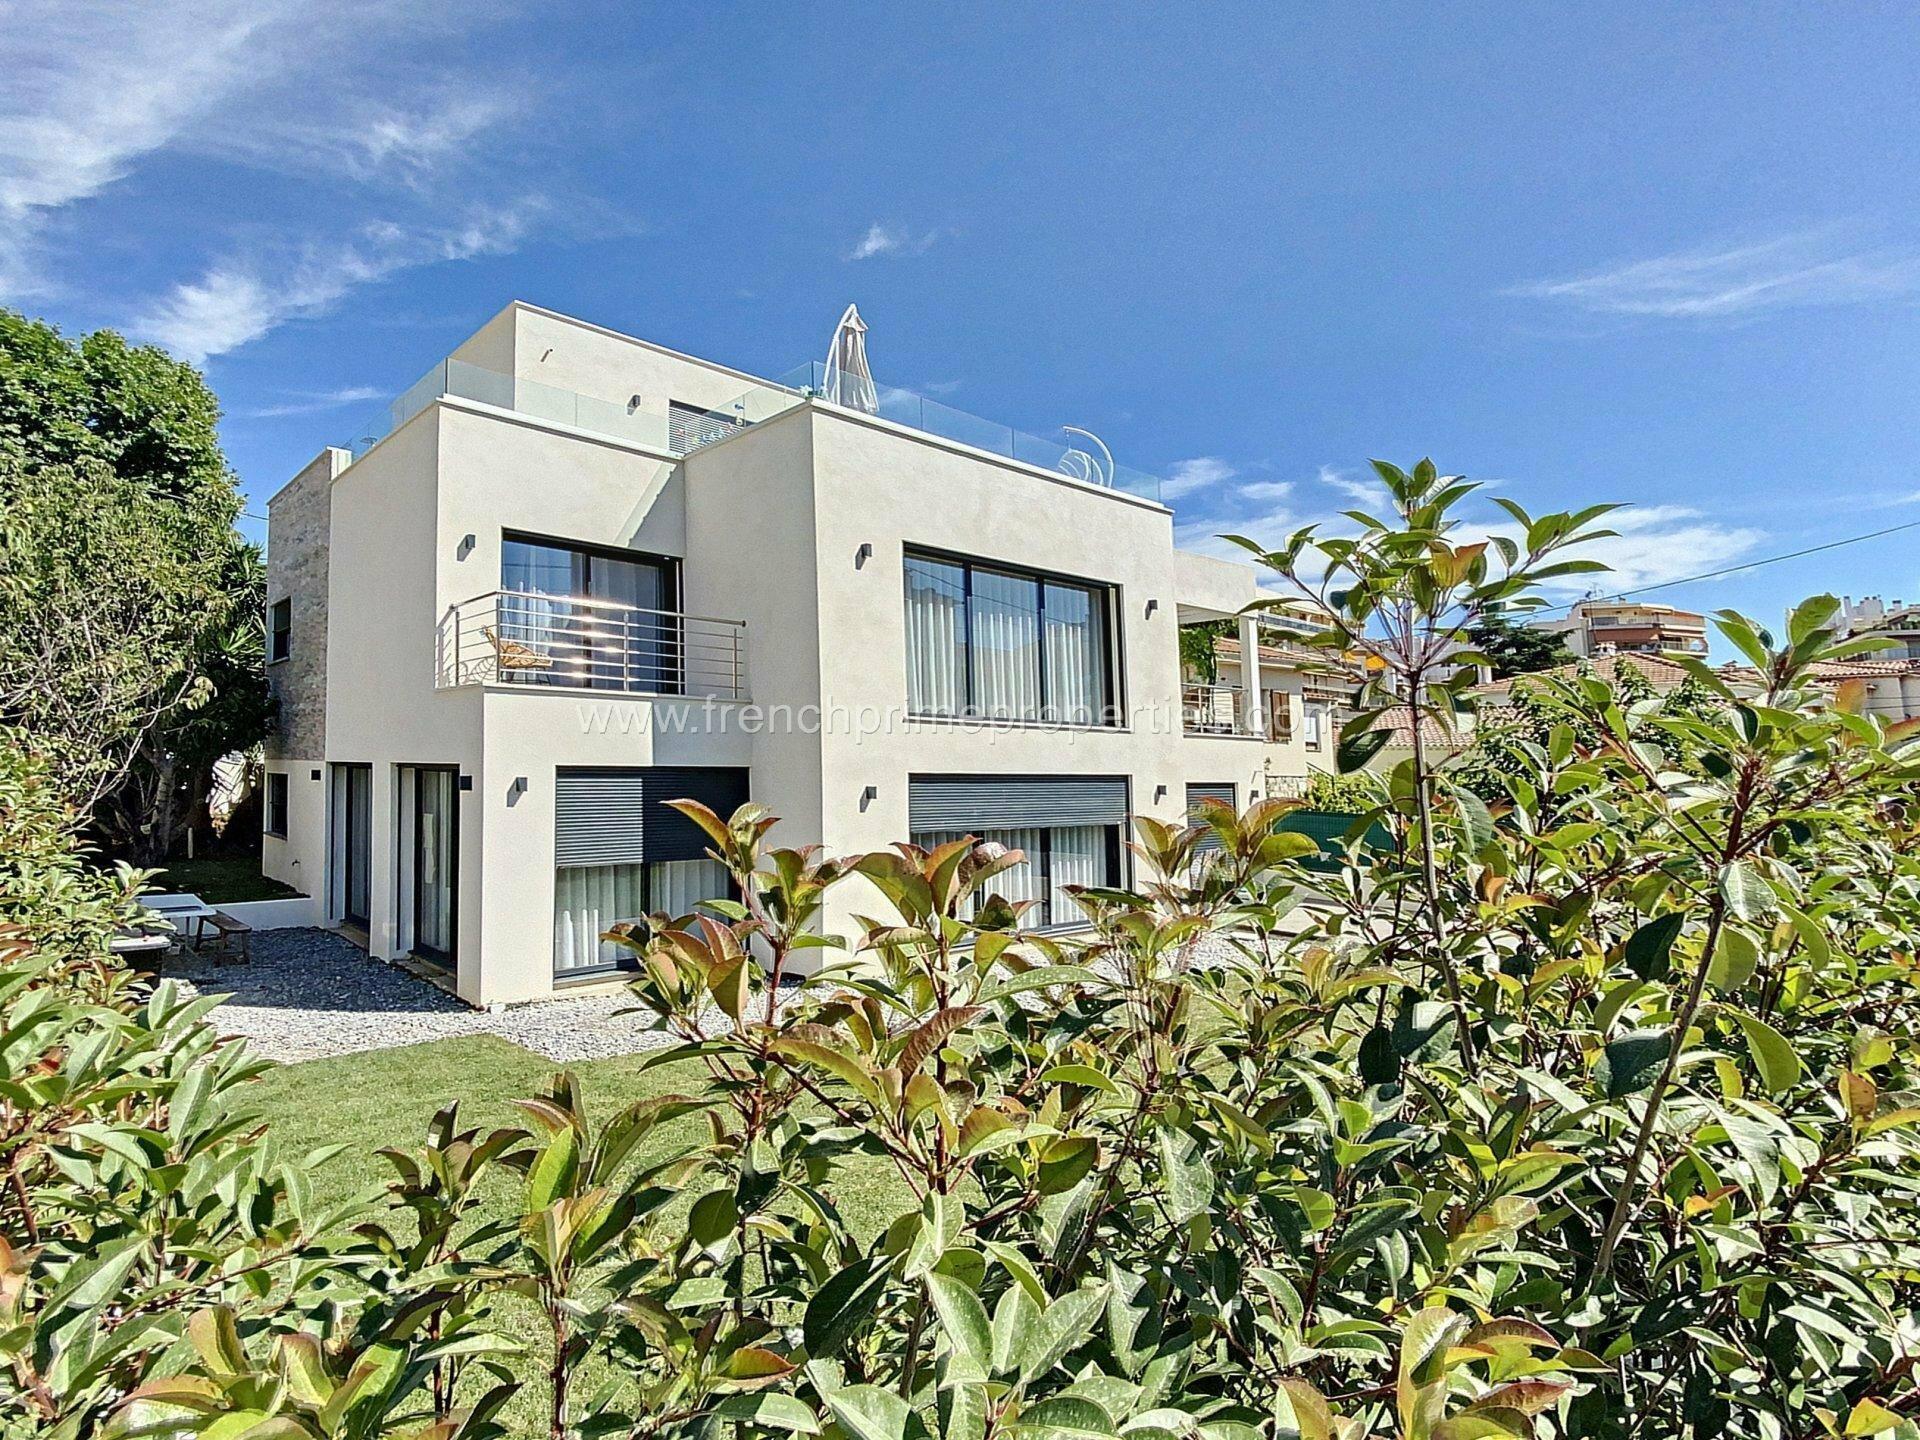 Villa in Antibes, Provence-Alpes-Côte d'Azur, France 1 - 11506361